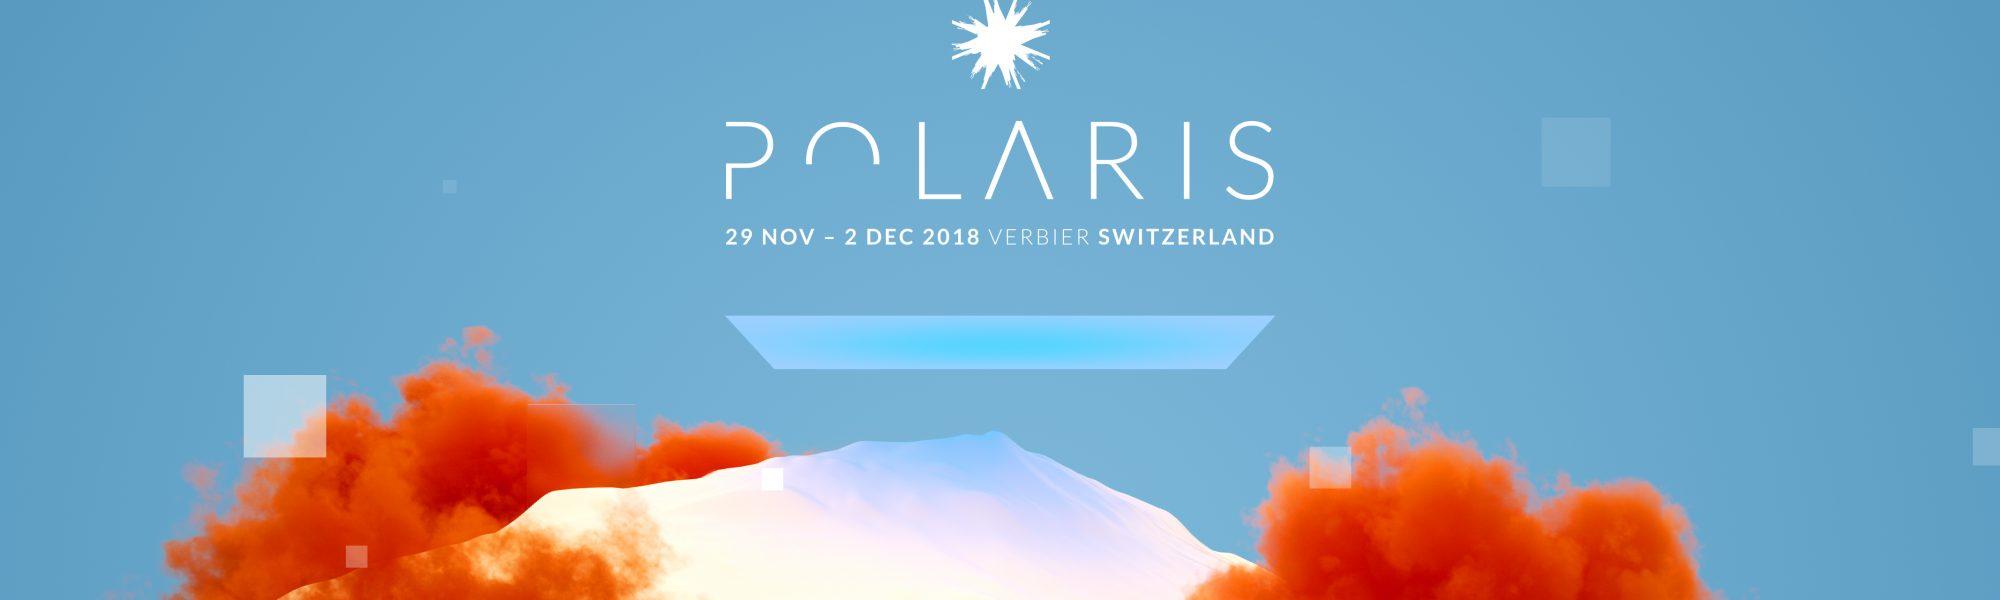 back--polaris-logo